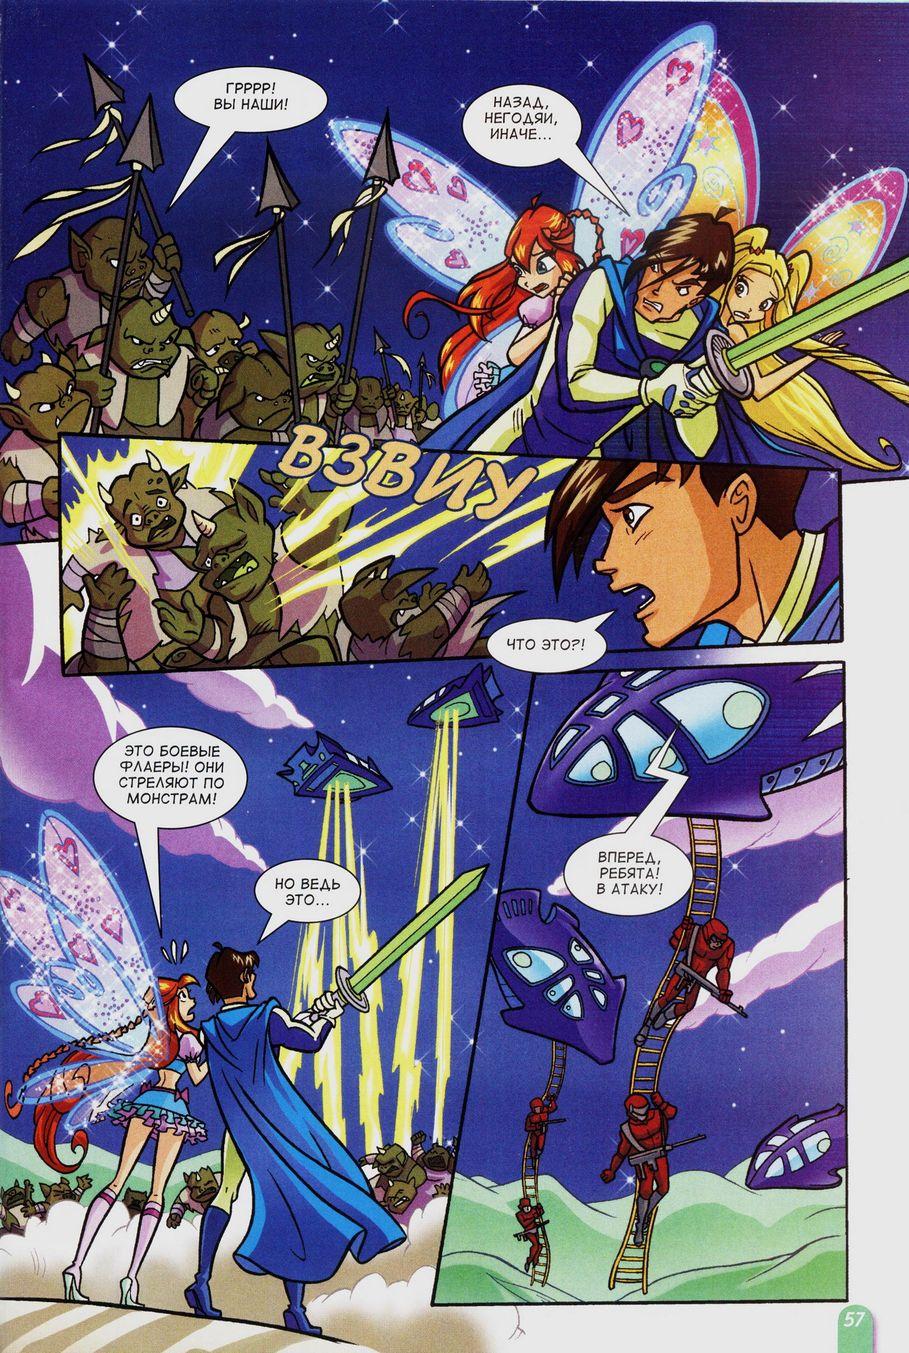 Комикс Винкс Winx - Волшебник Камуд (Журнал Винкс №6 2011) - стр. 57